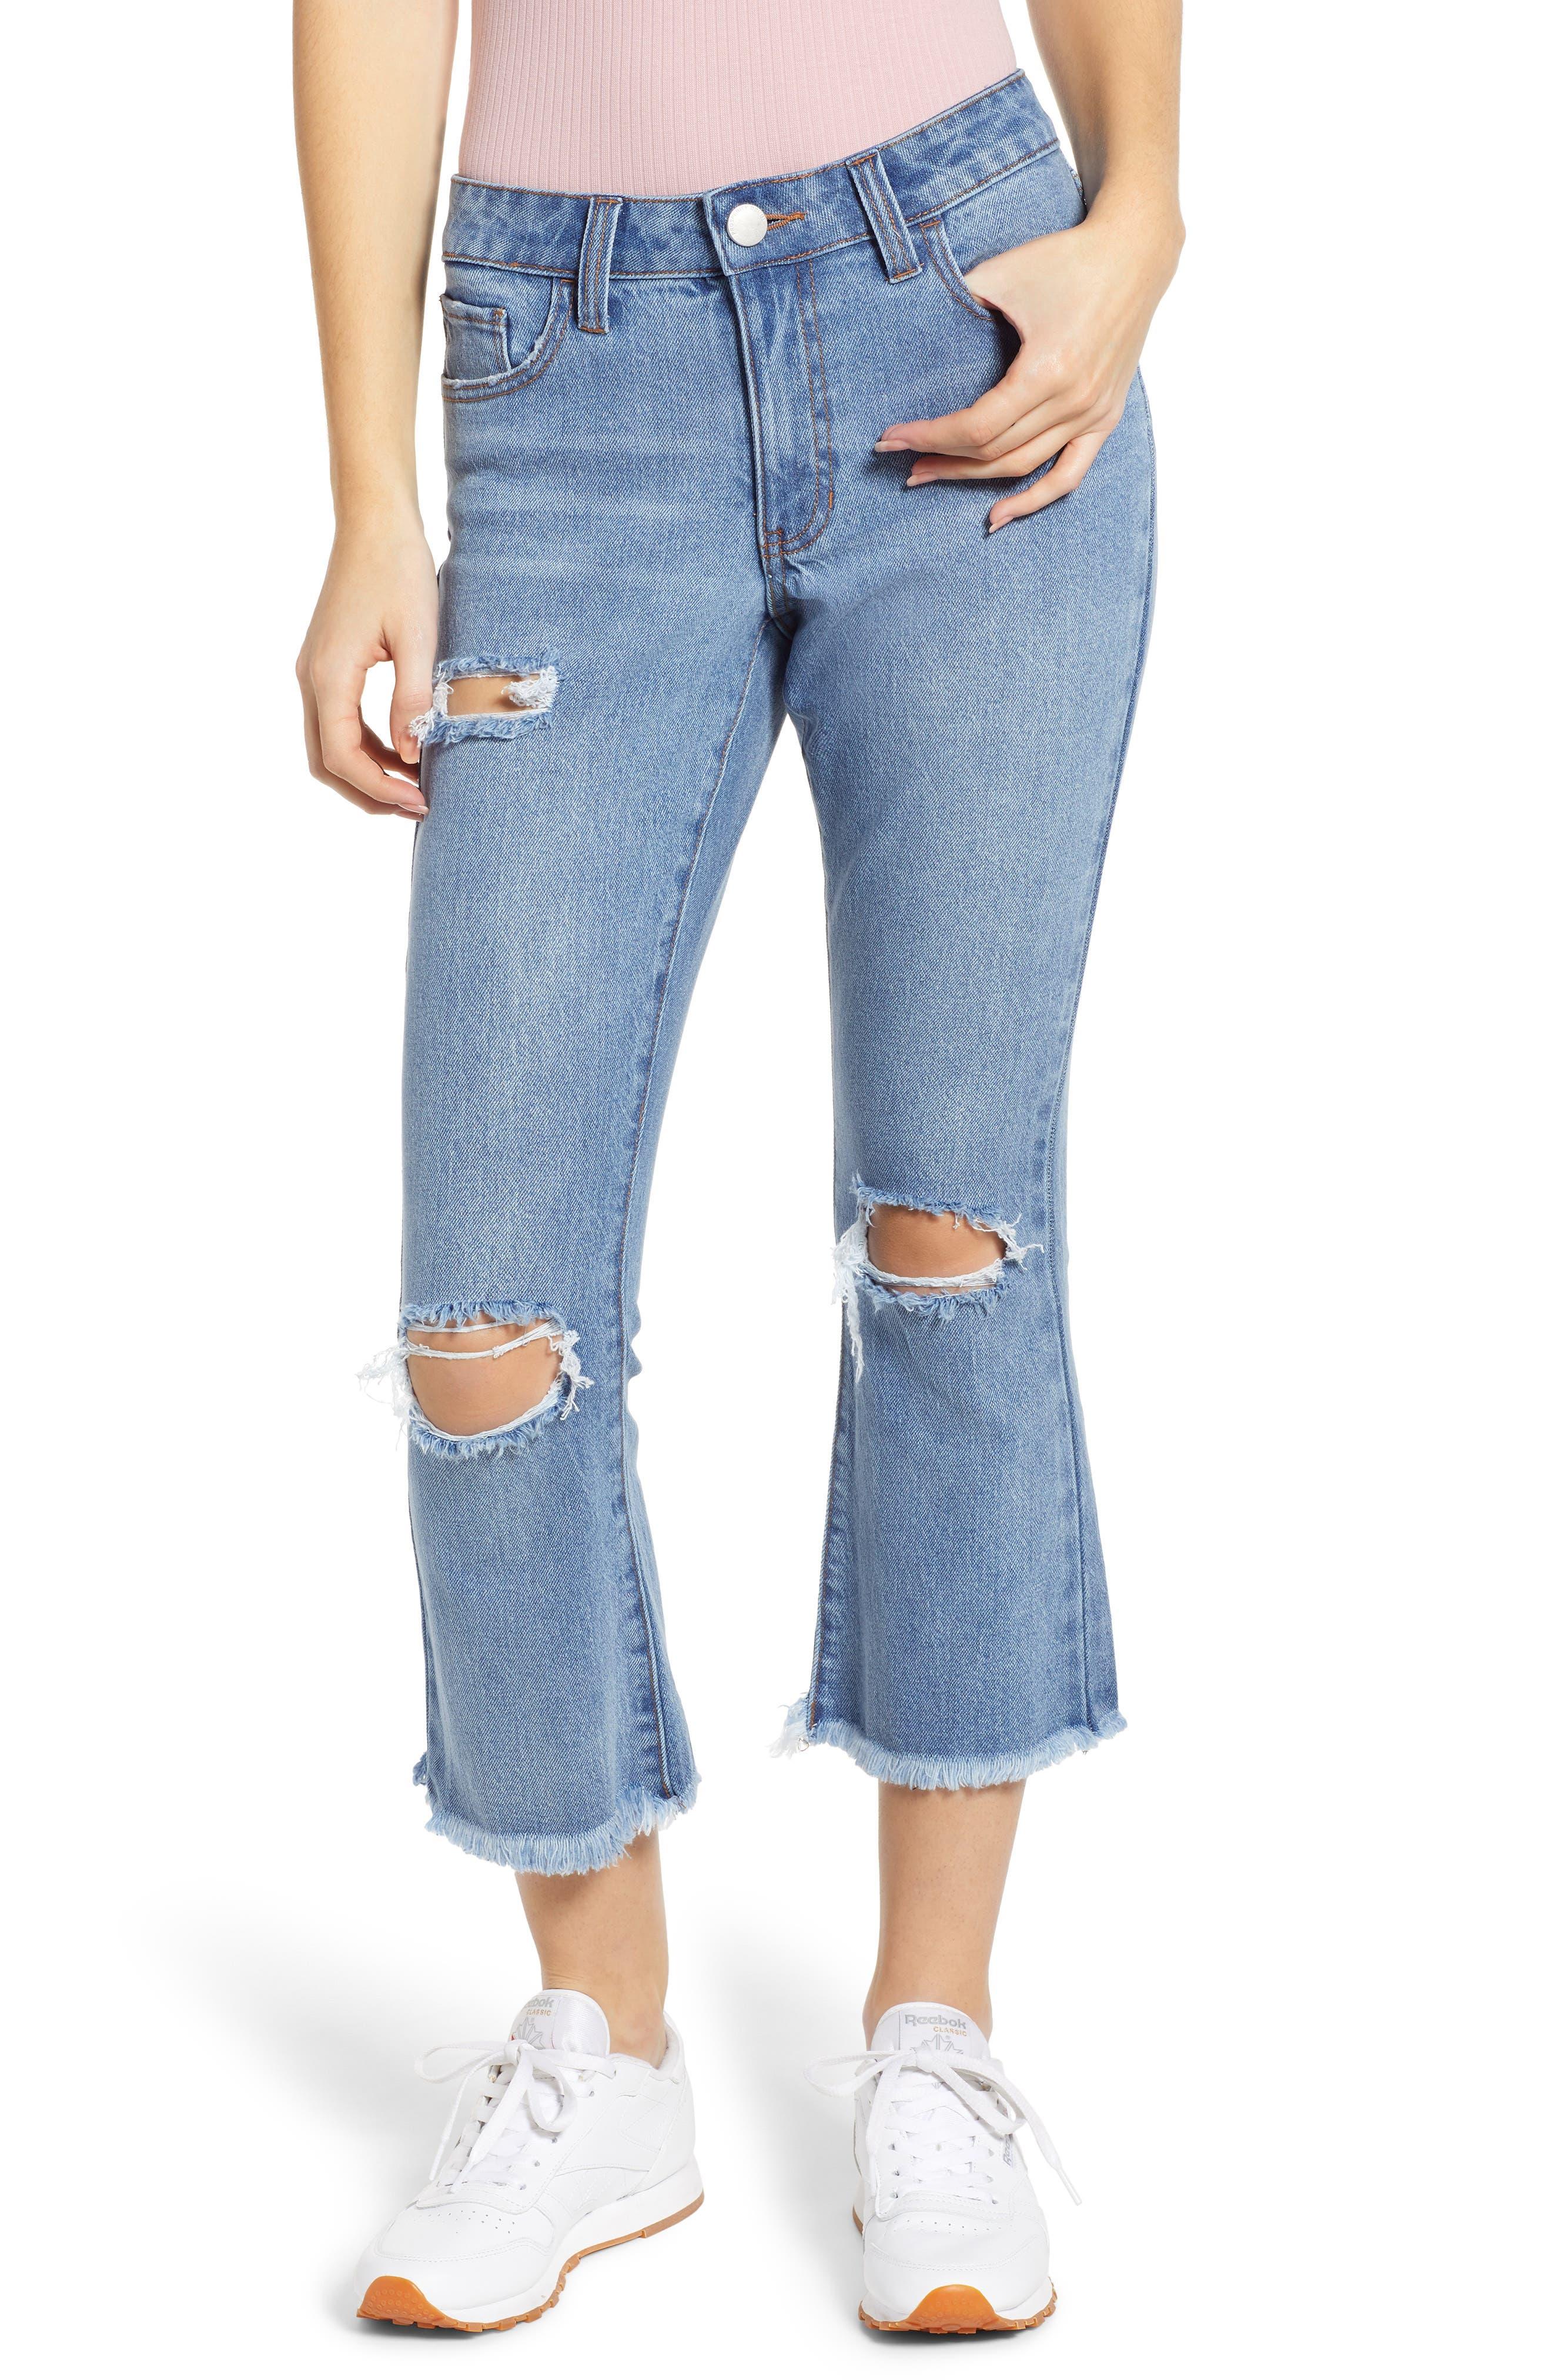 PROSPERITY DENIM, Ripped Crop Flare Jeans, Main thumbnail 1, color, MEDIUM WASH